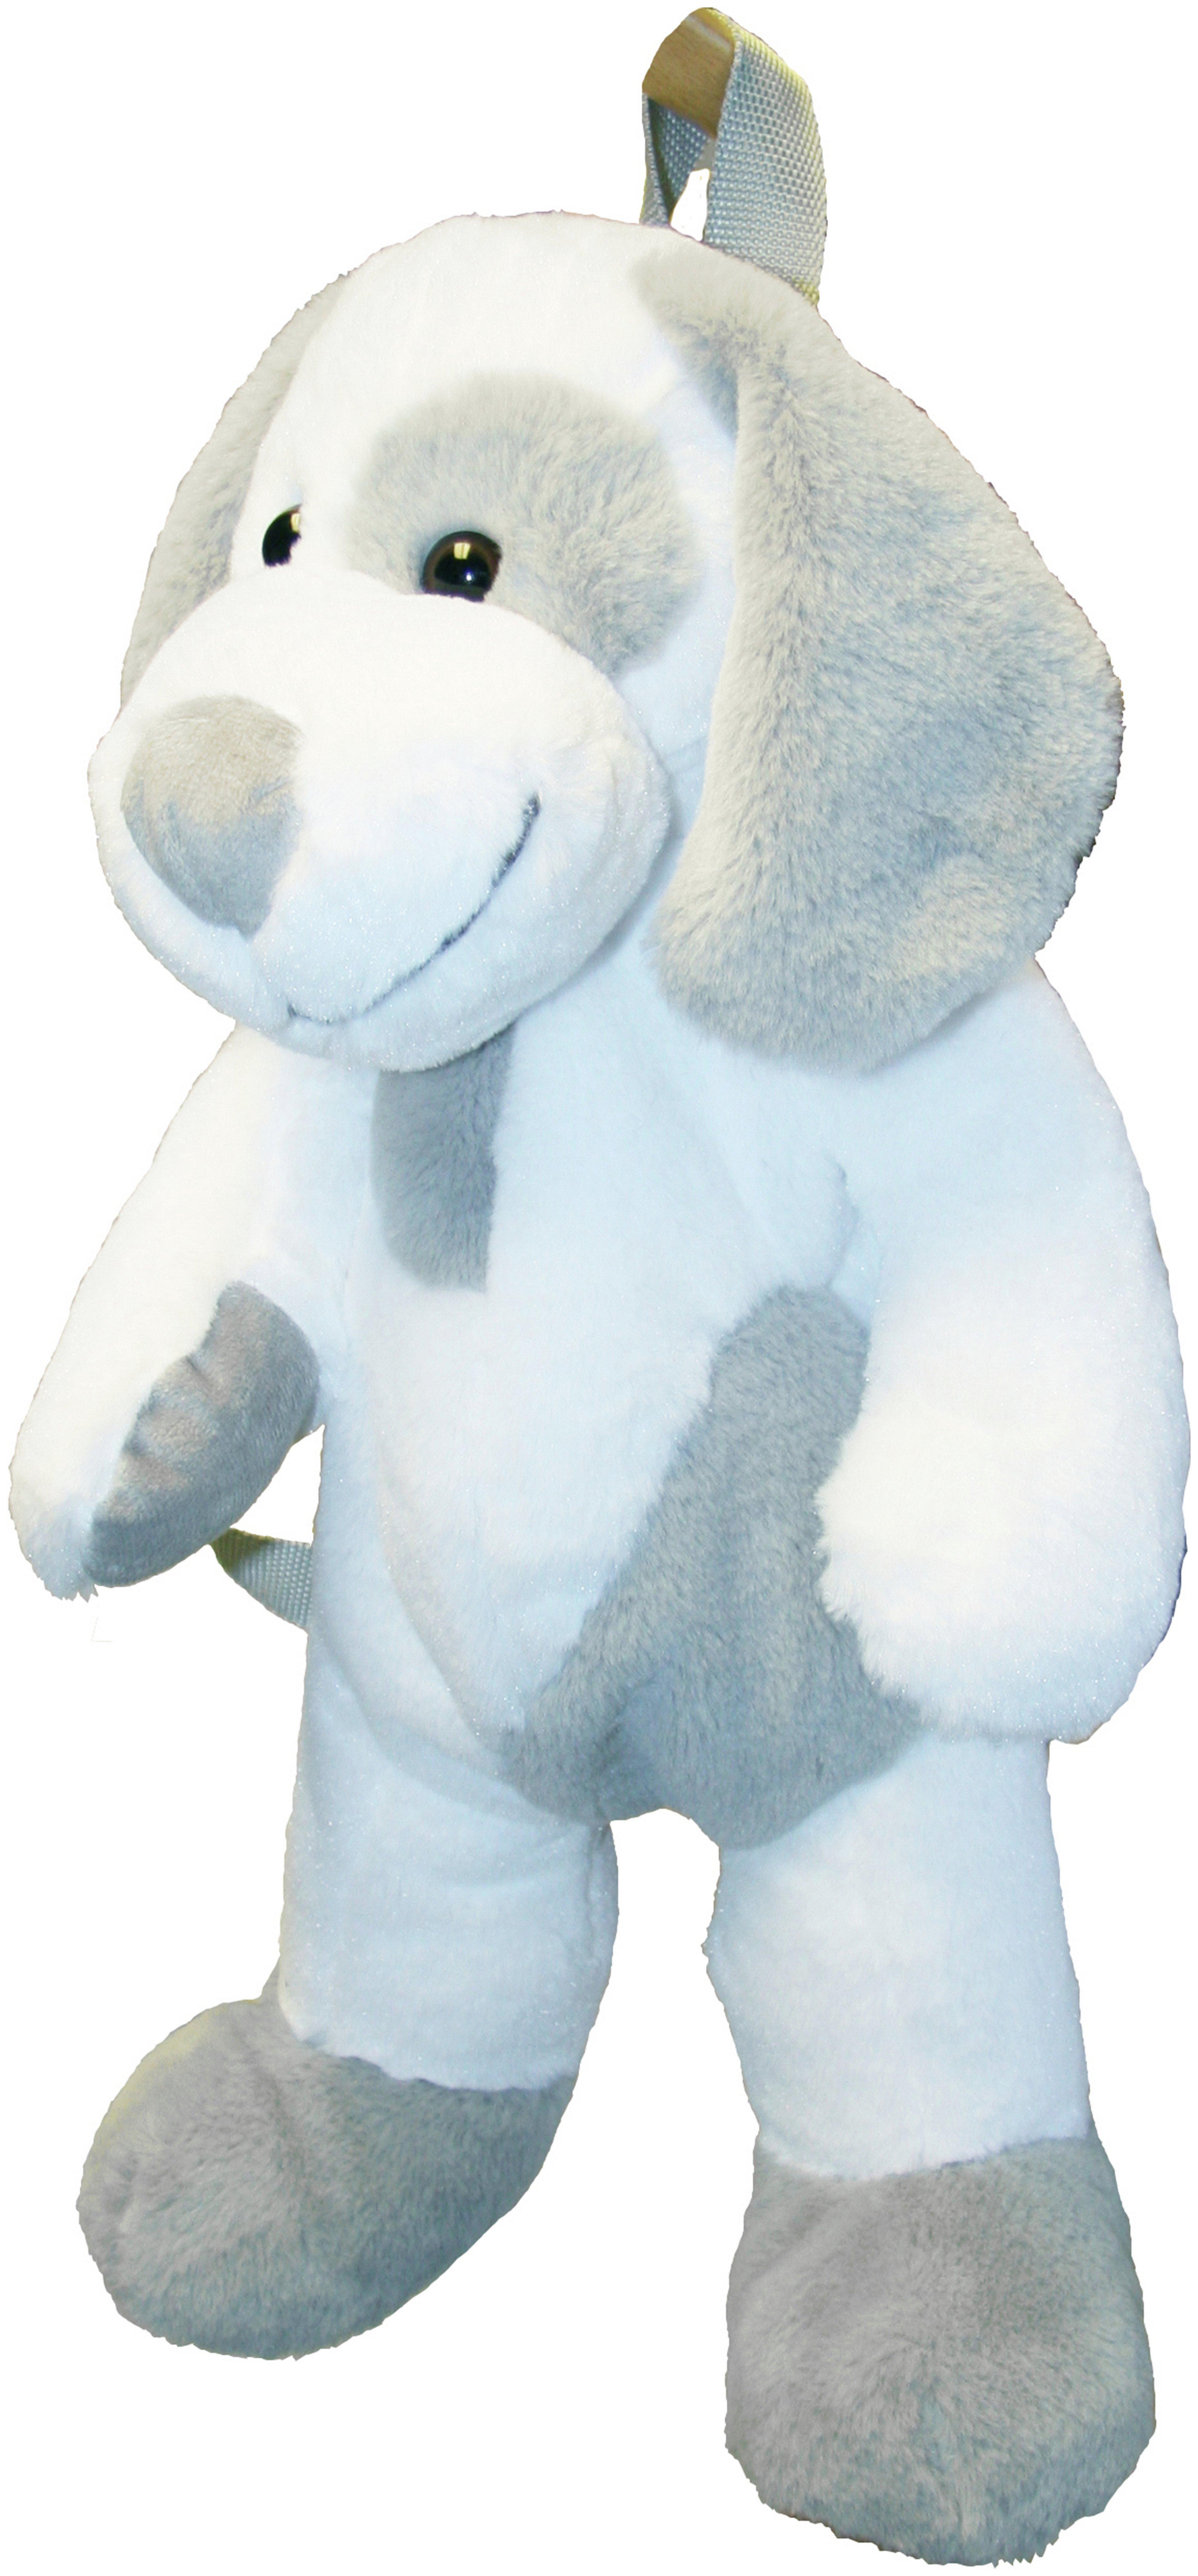 Image of Great Gizmos Dog Backpack - Grey & White.